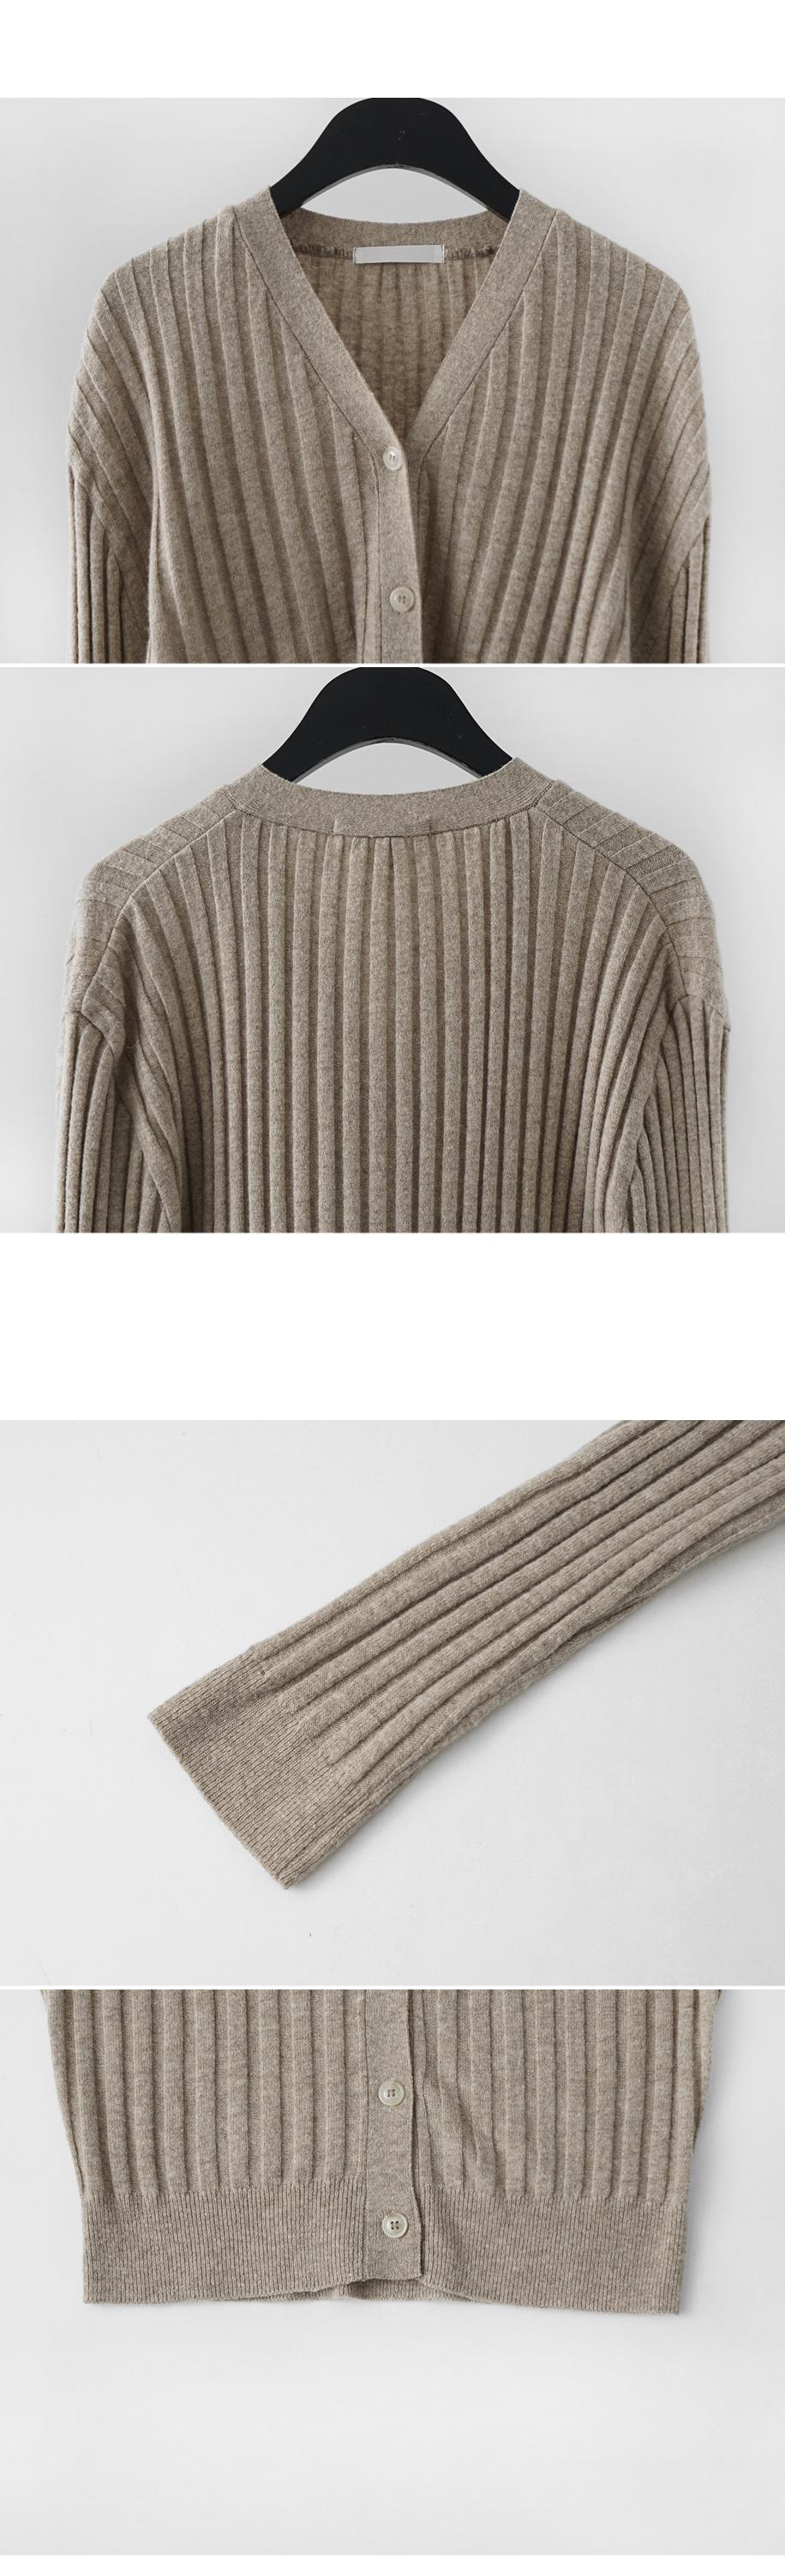 natural mix V-neck cardigan